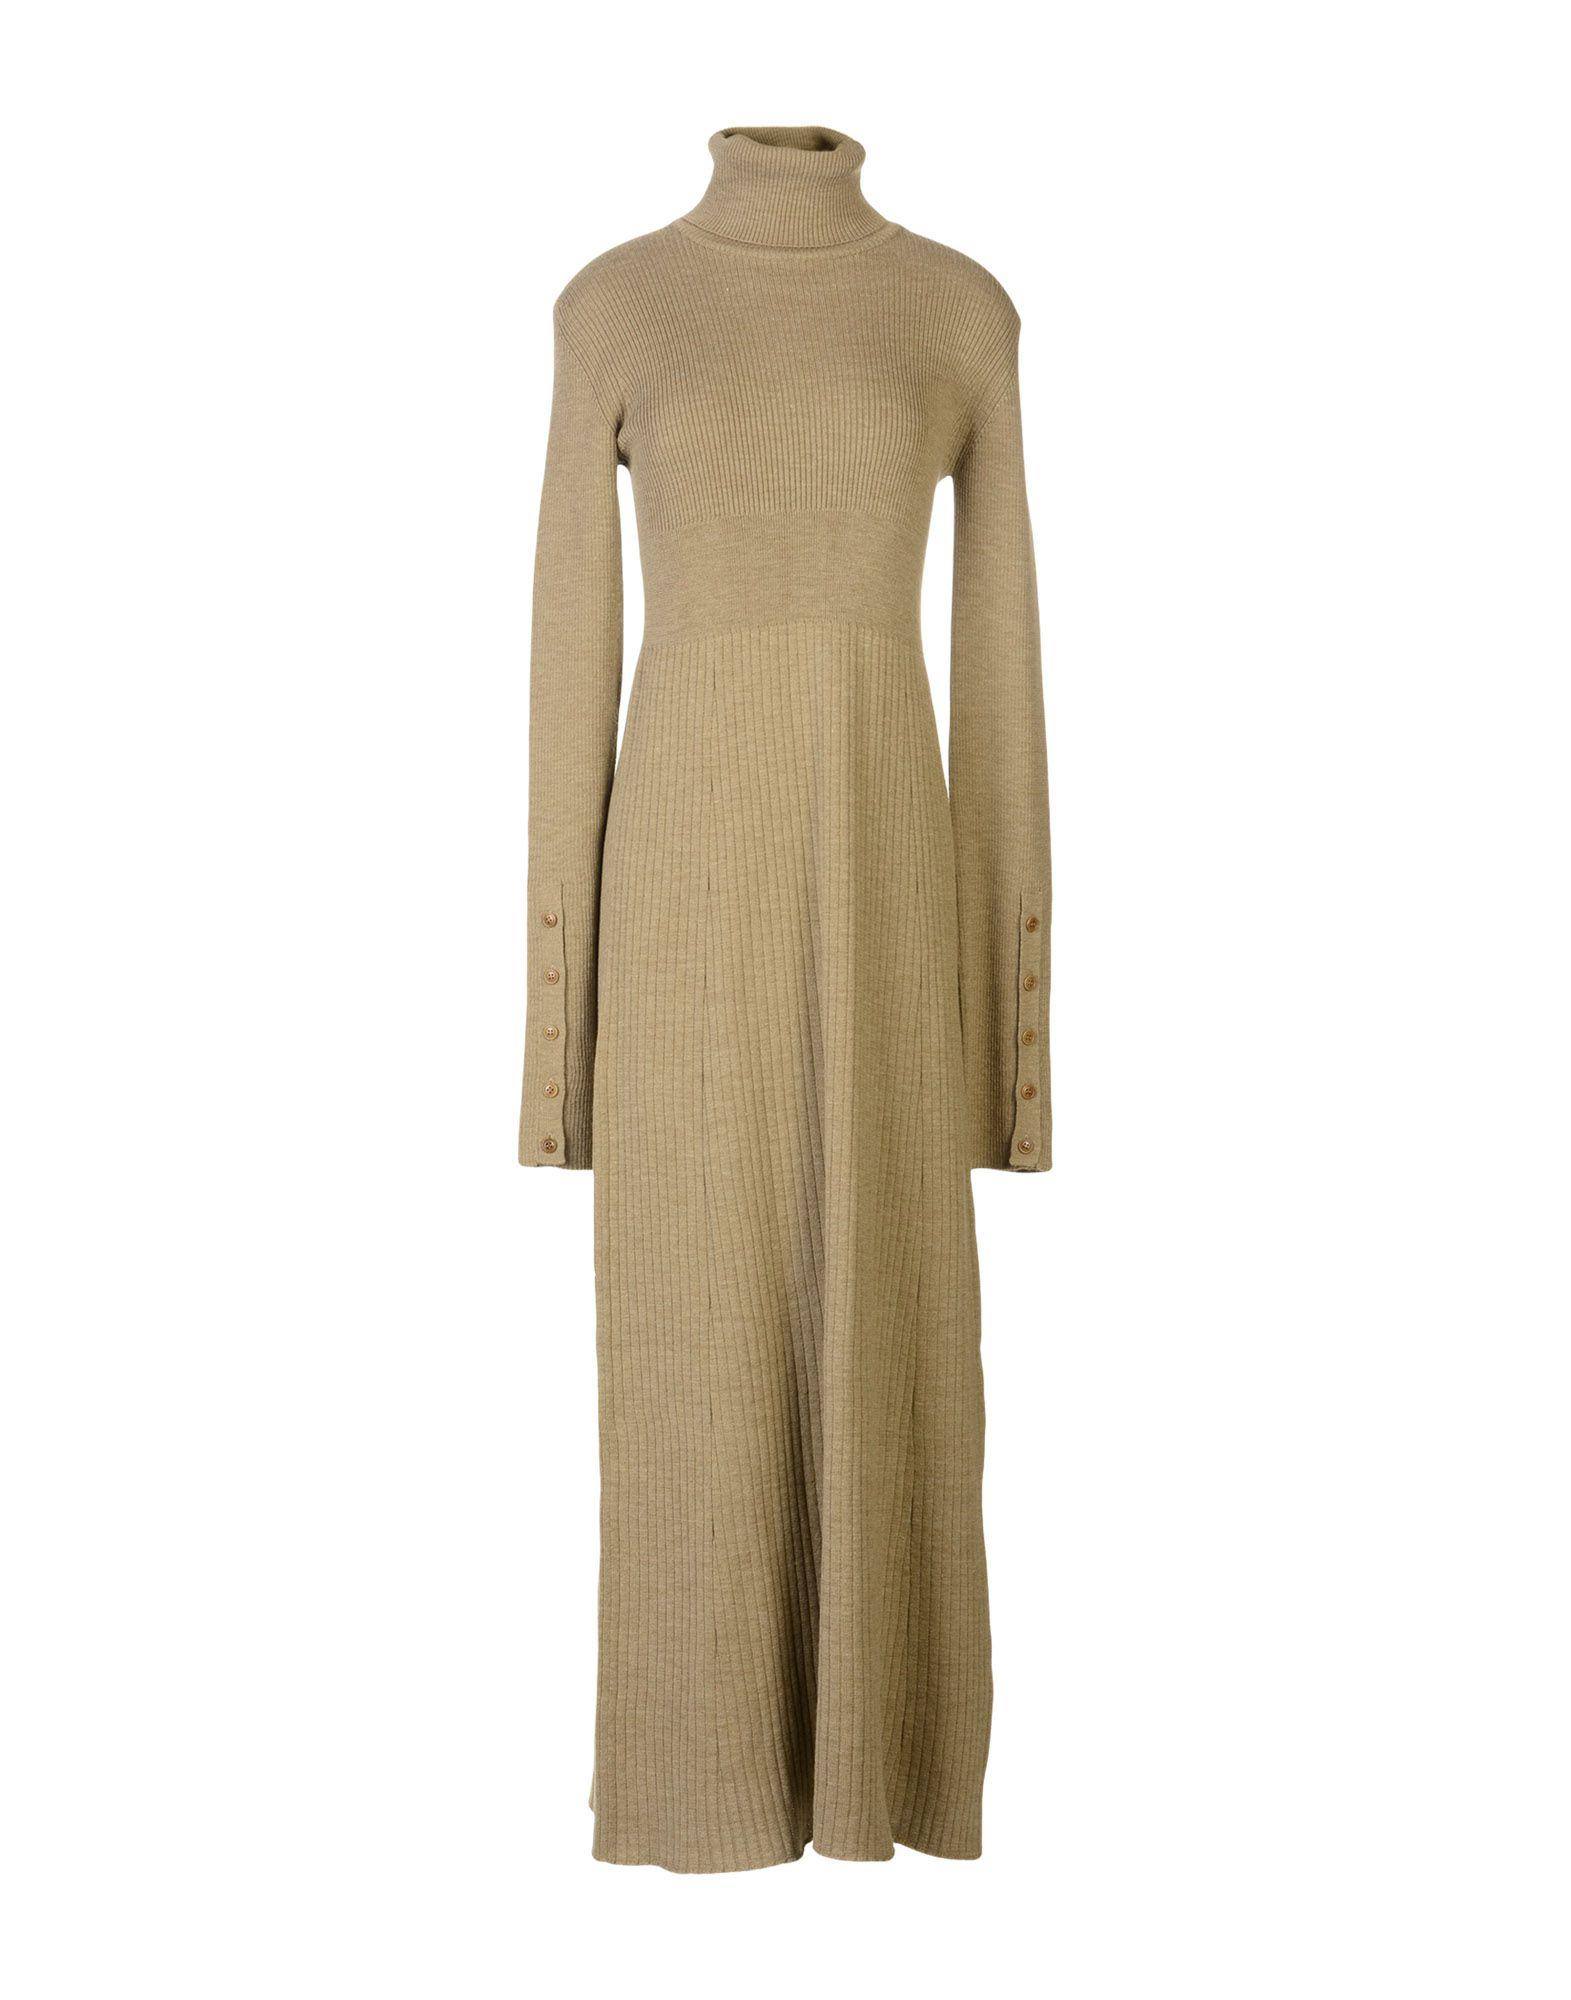 DIESEL BLACK GOLD Длинное платье платье diesel 00s2d4 0carg 900